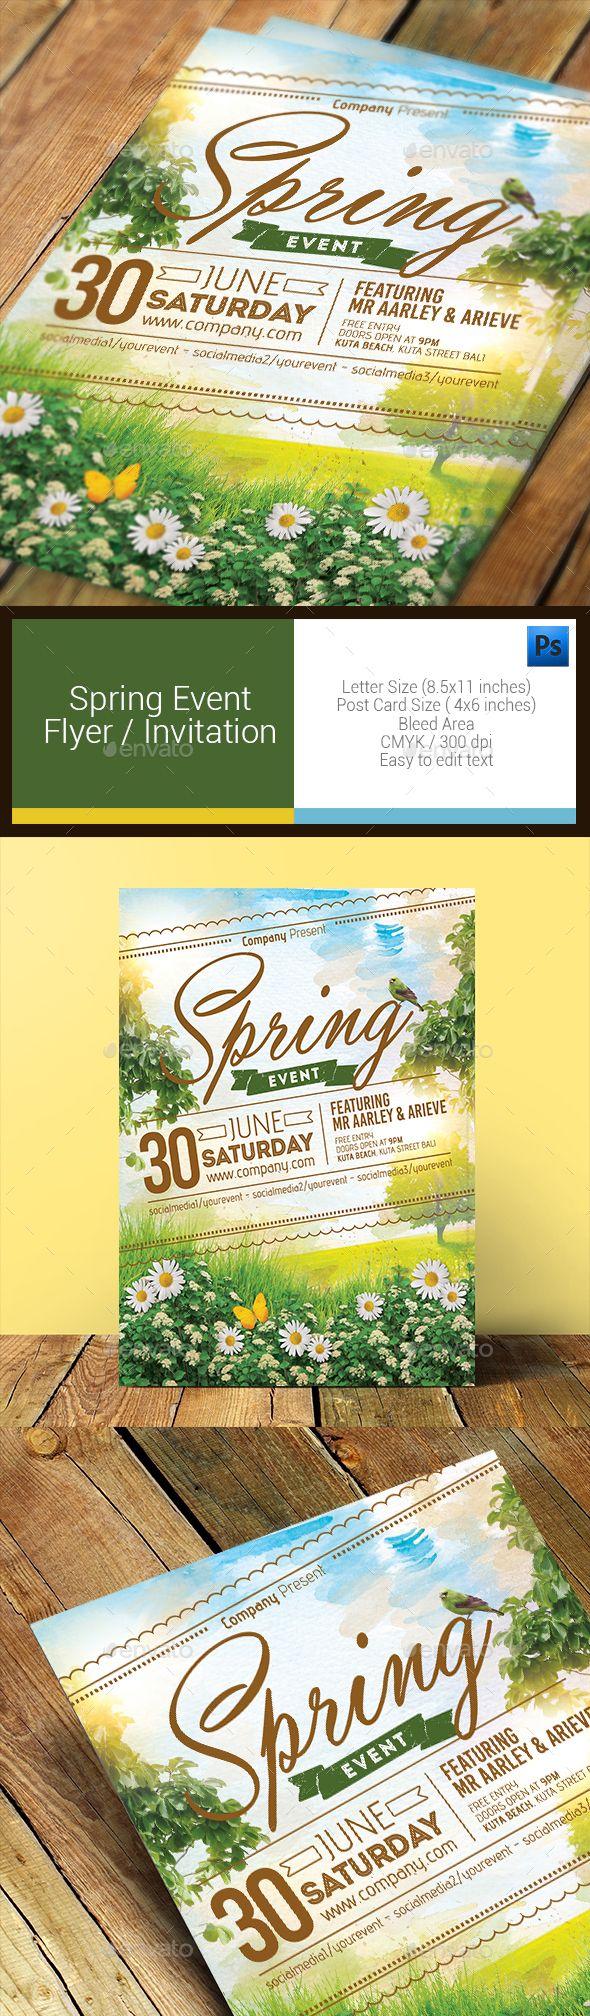 Spring Event Flyer Invitation Photoshop Psd Spring Break